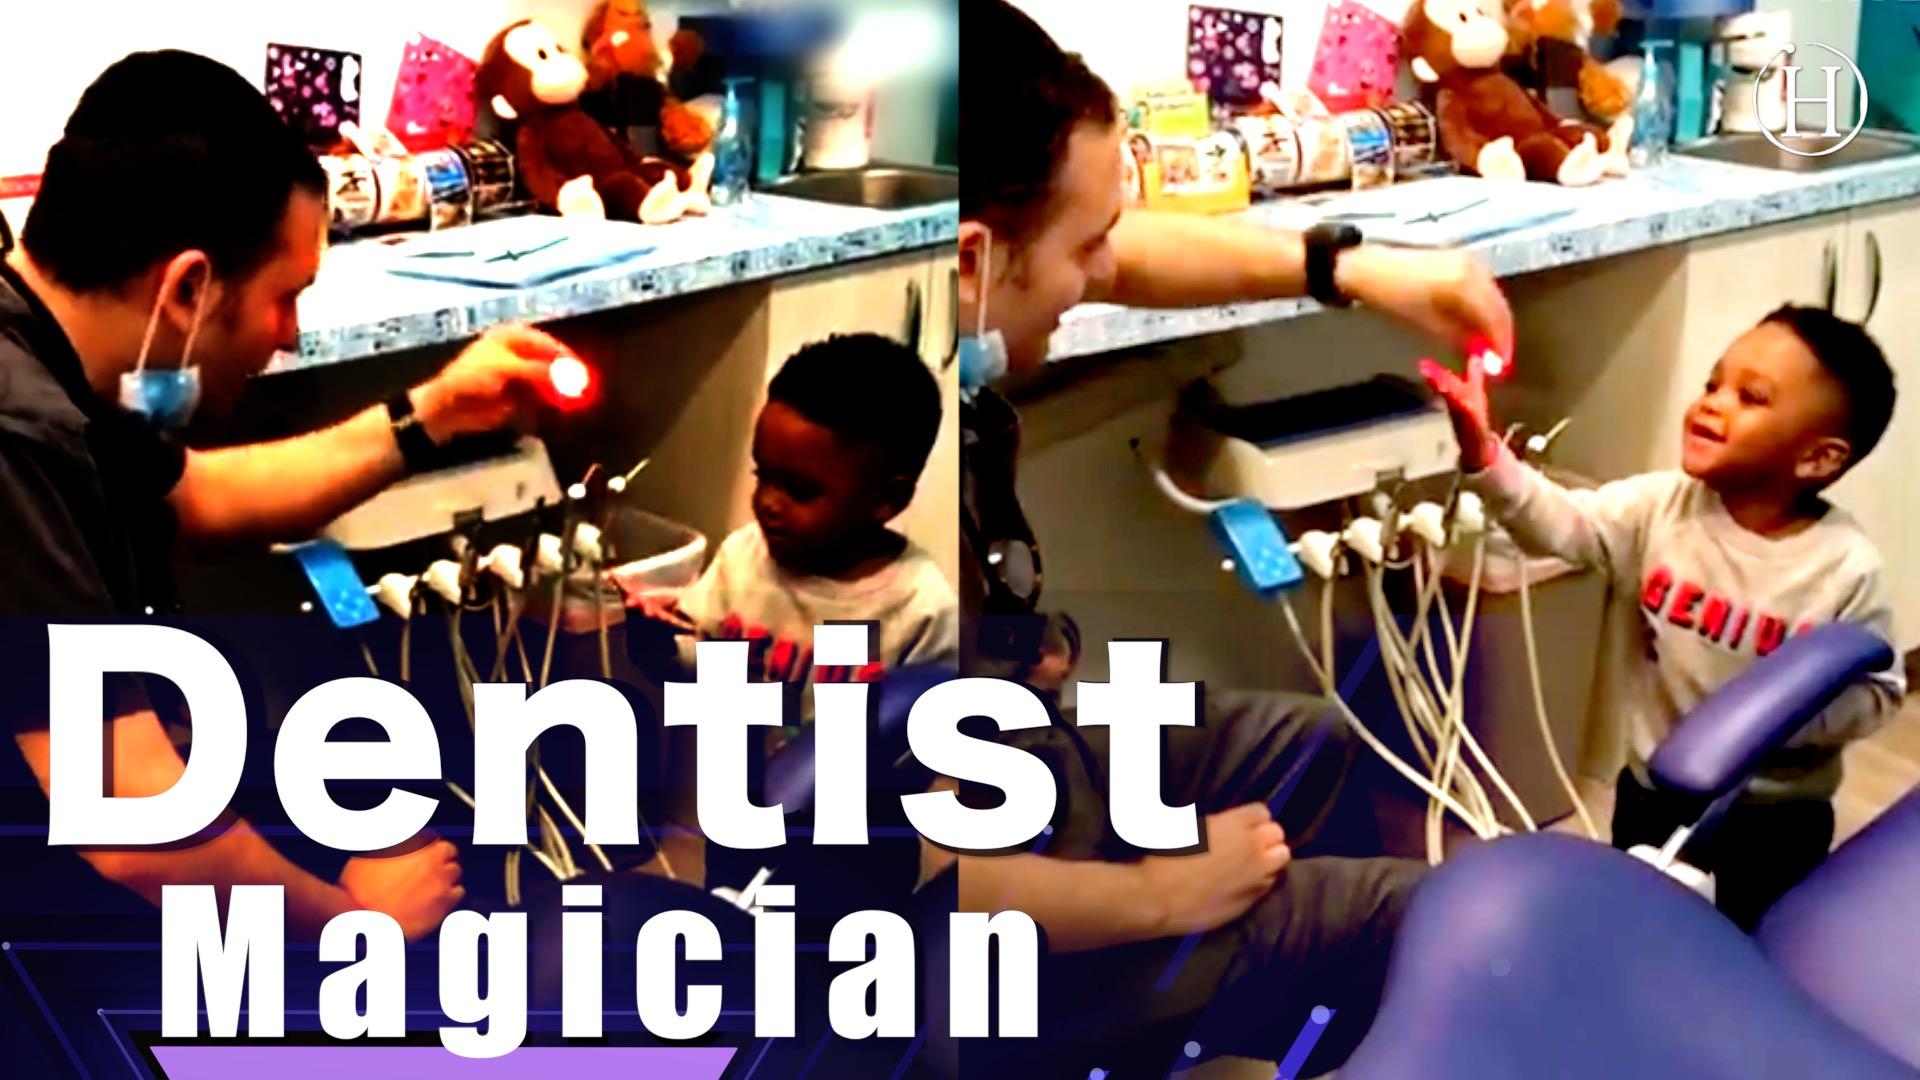 Dentist Magician Entertains Kid   Humanity Life